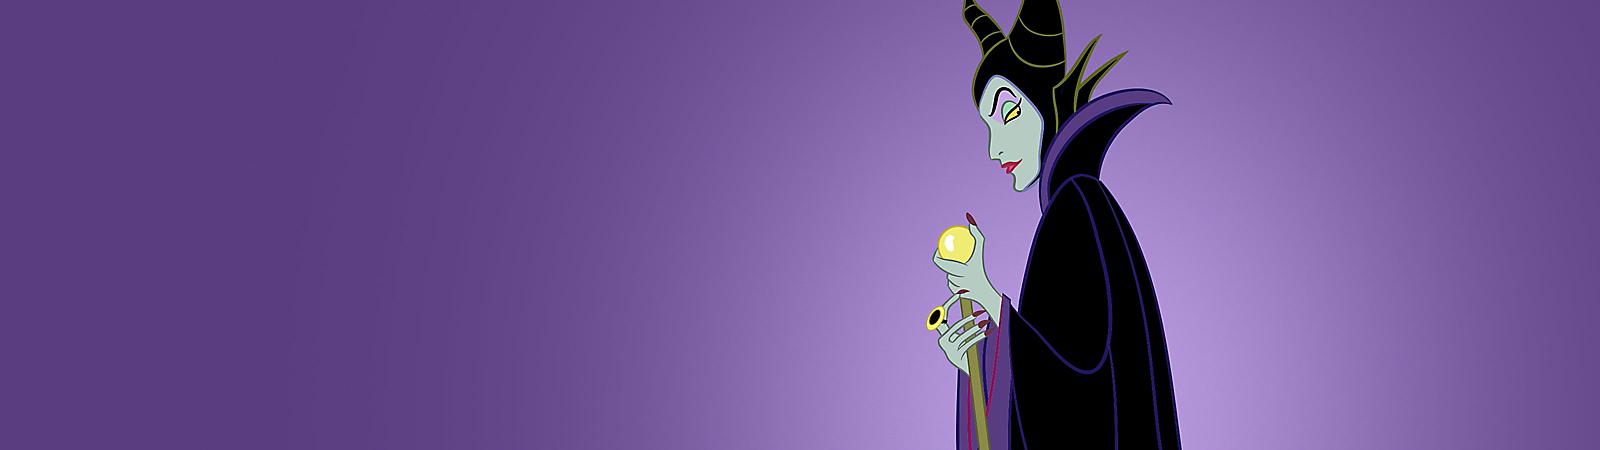 Maleficent Sleeping Beauty Shopdisney